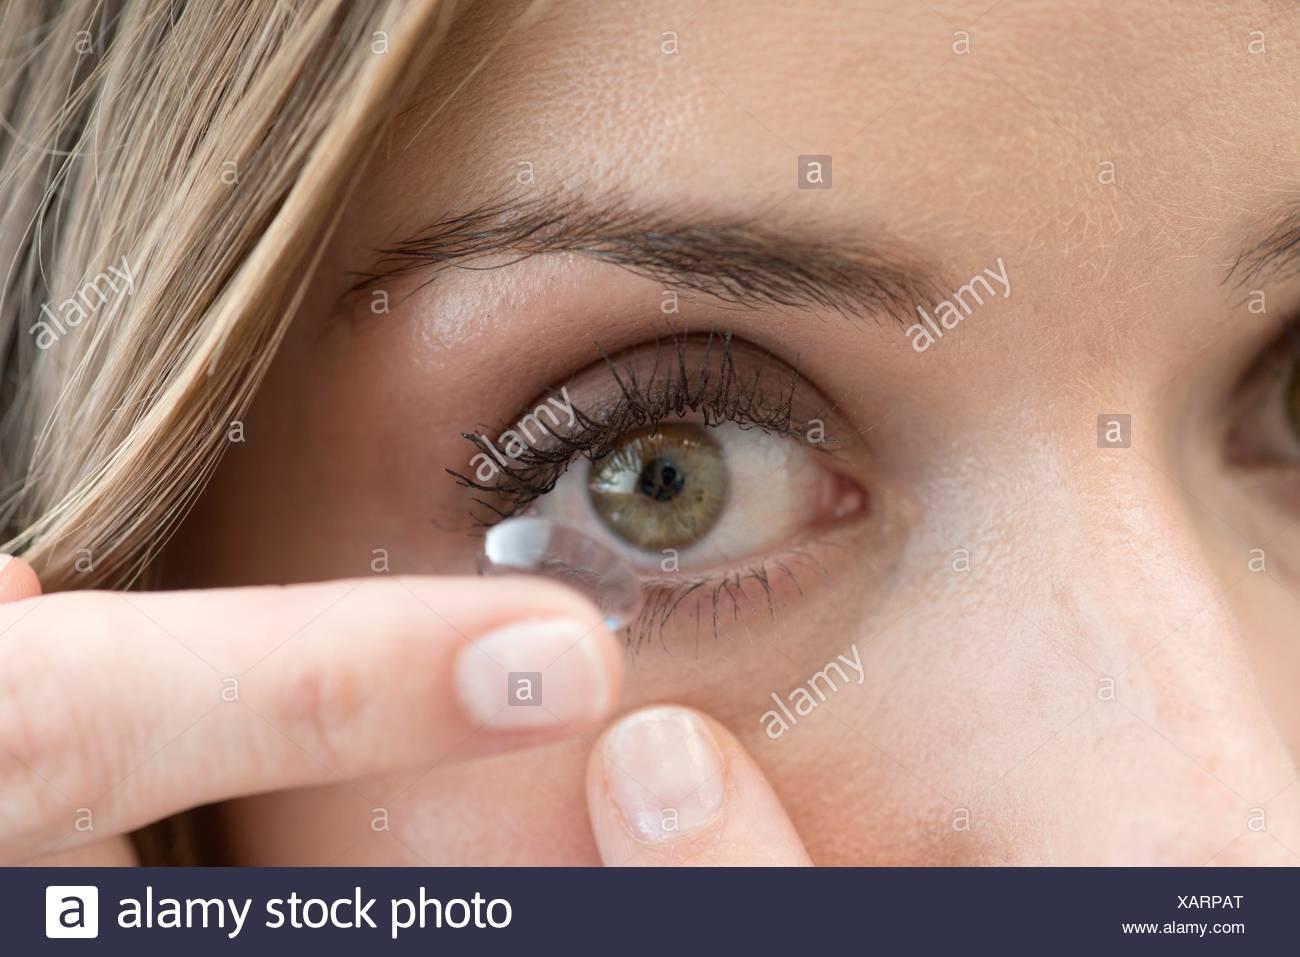 Mitte Erwachsene Frau Kontaktlinsen ins Auge. Stockbild